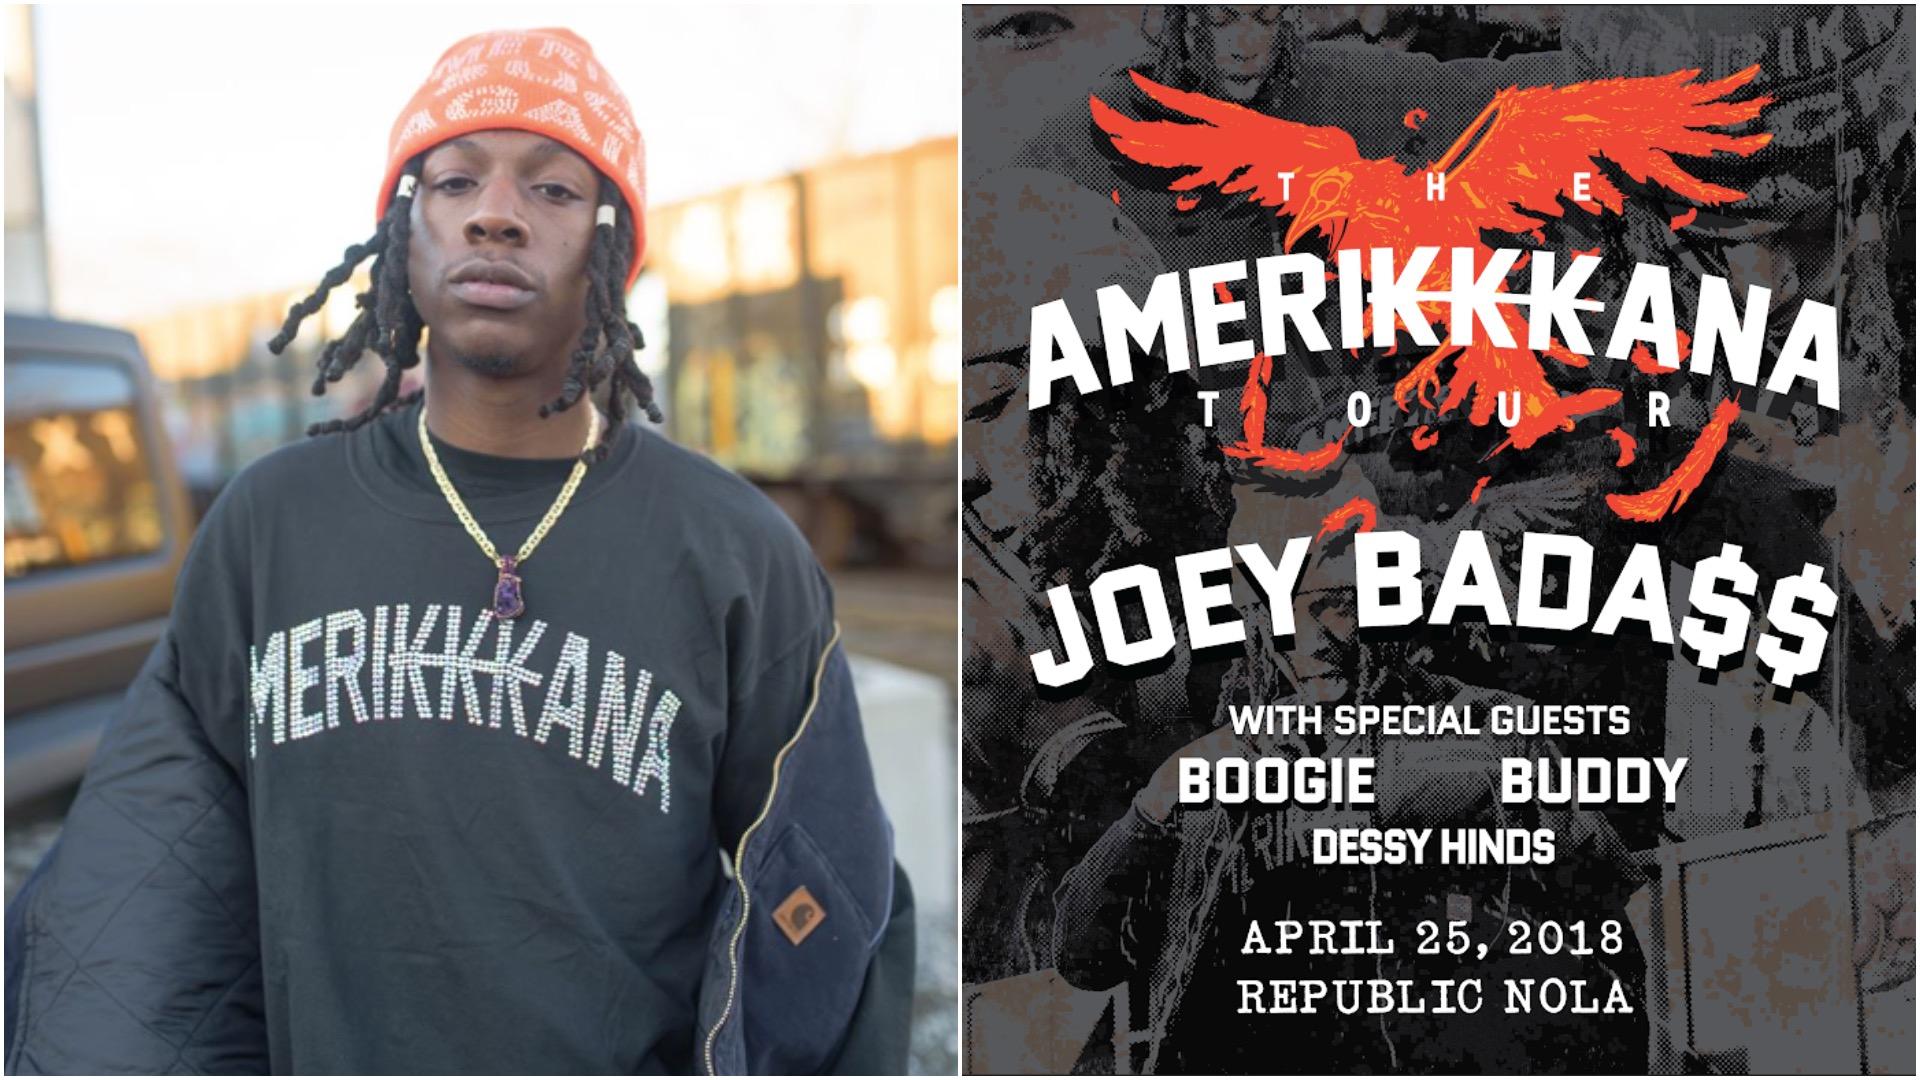 Joey Bada$$ Amerikkkana Tour NOLA